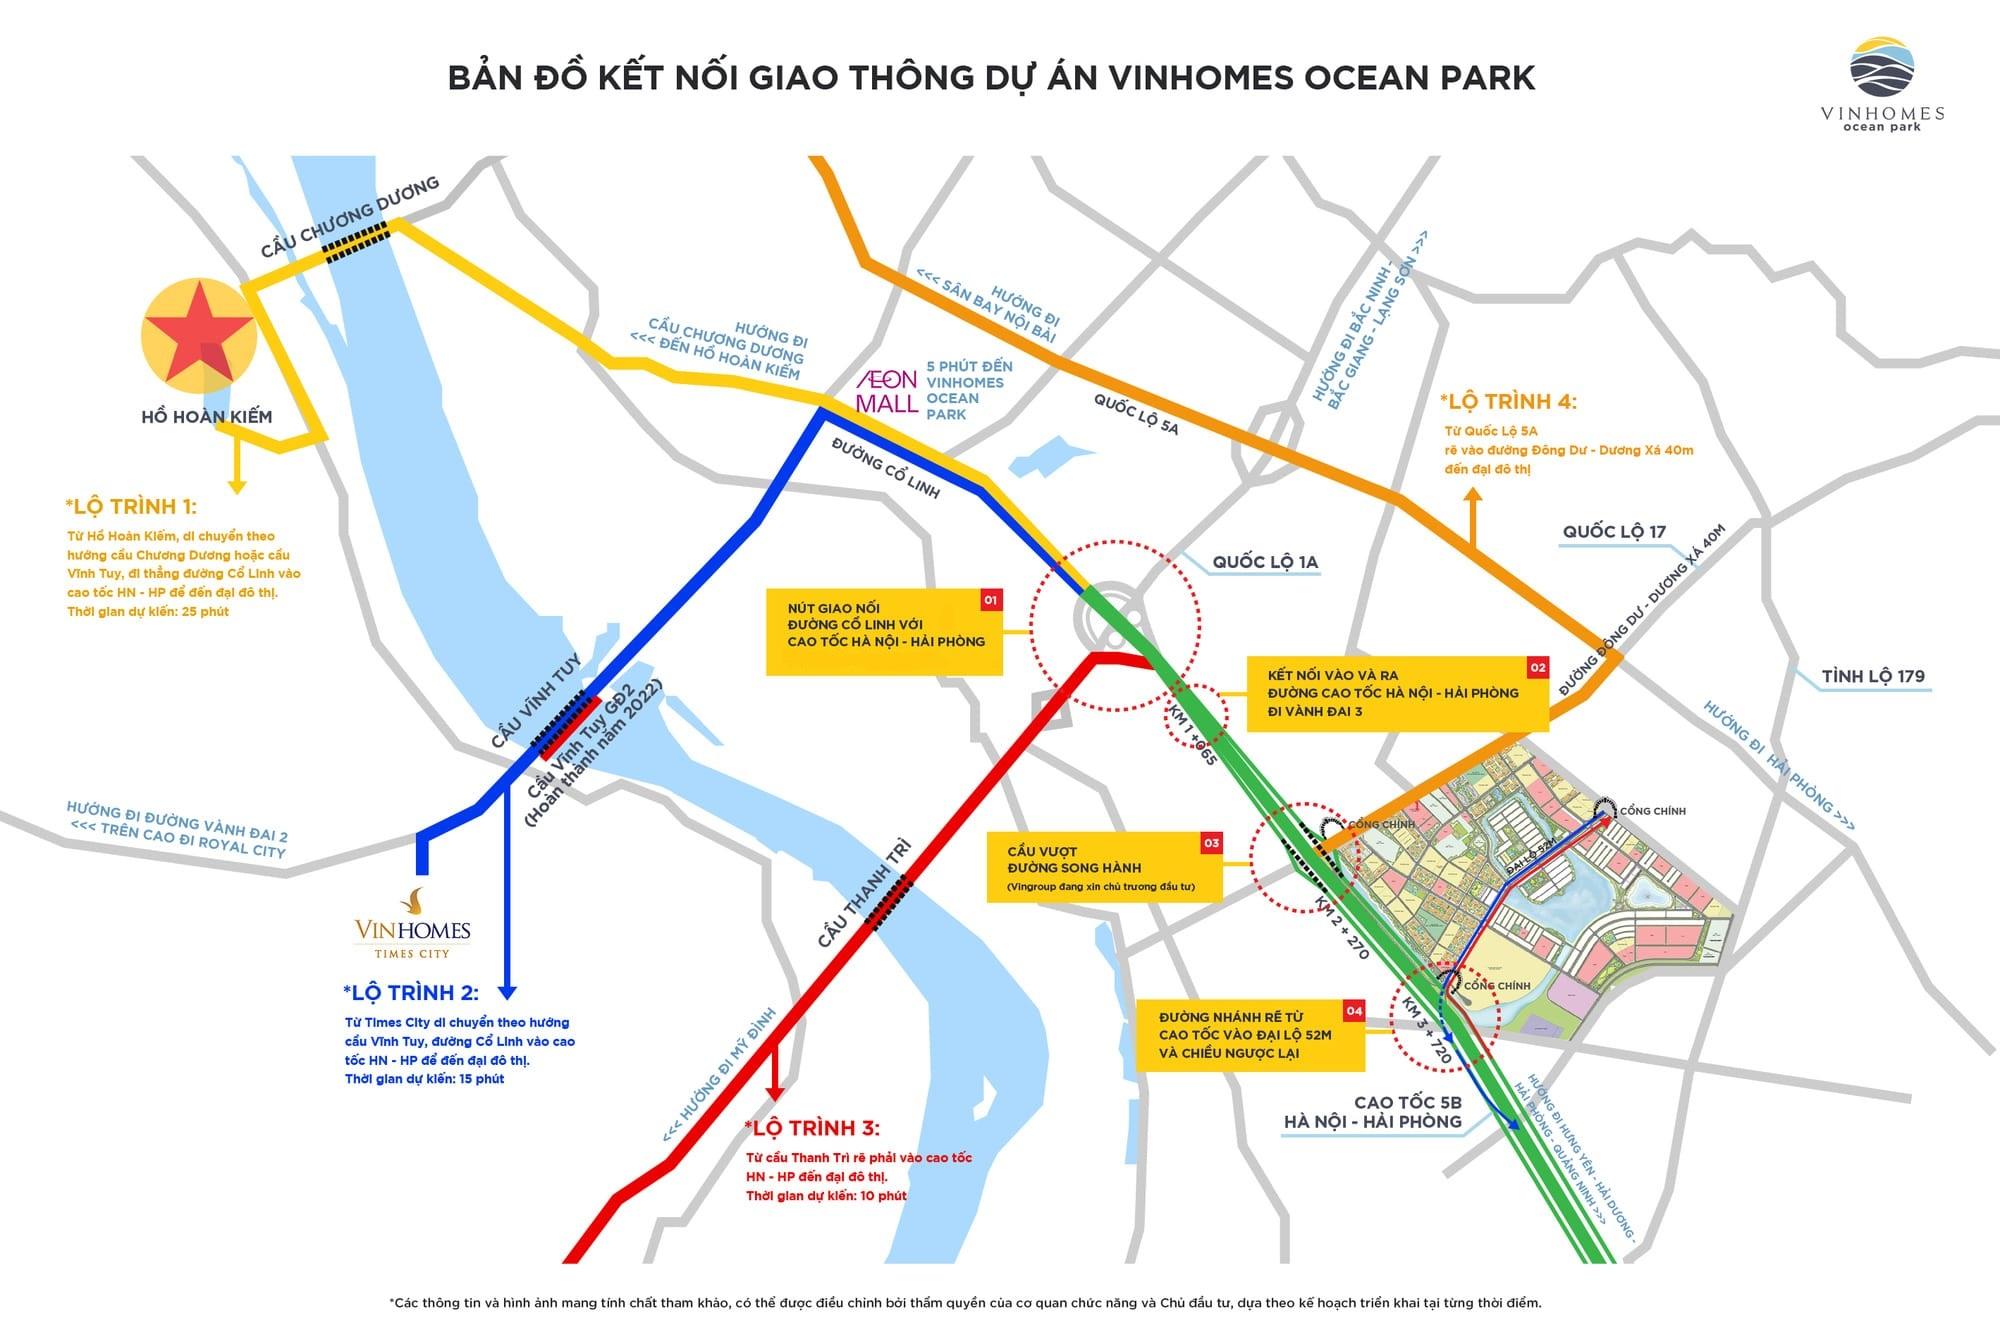 hinh anh tong quan vi tri vinhomes ocean park - thanh pho bien ho trong long Ha Noi so 2